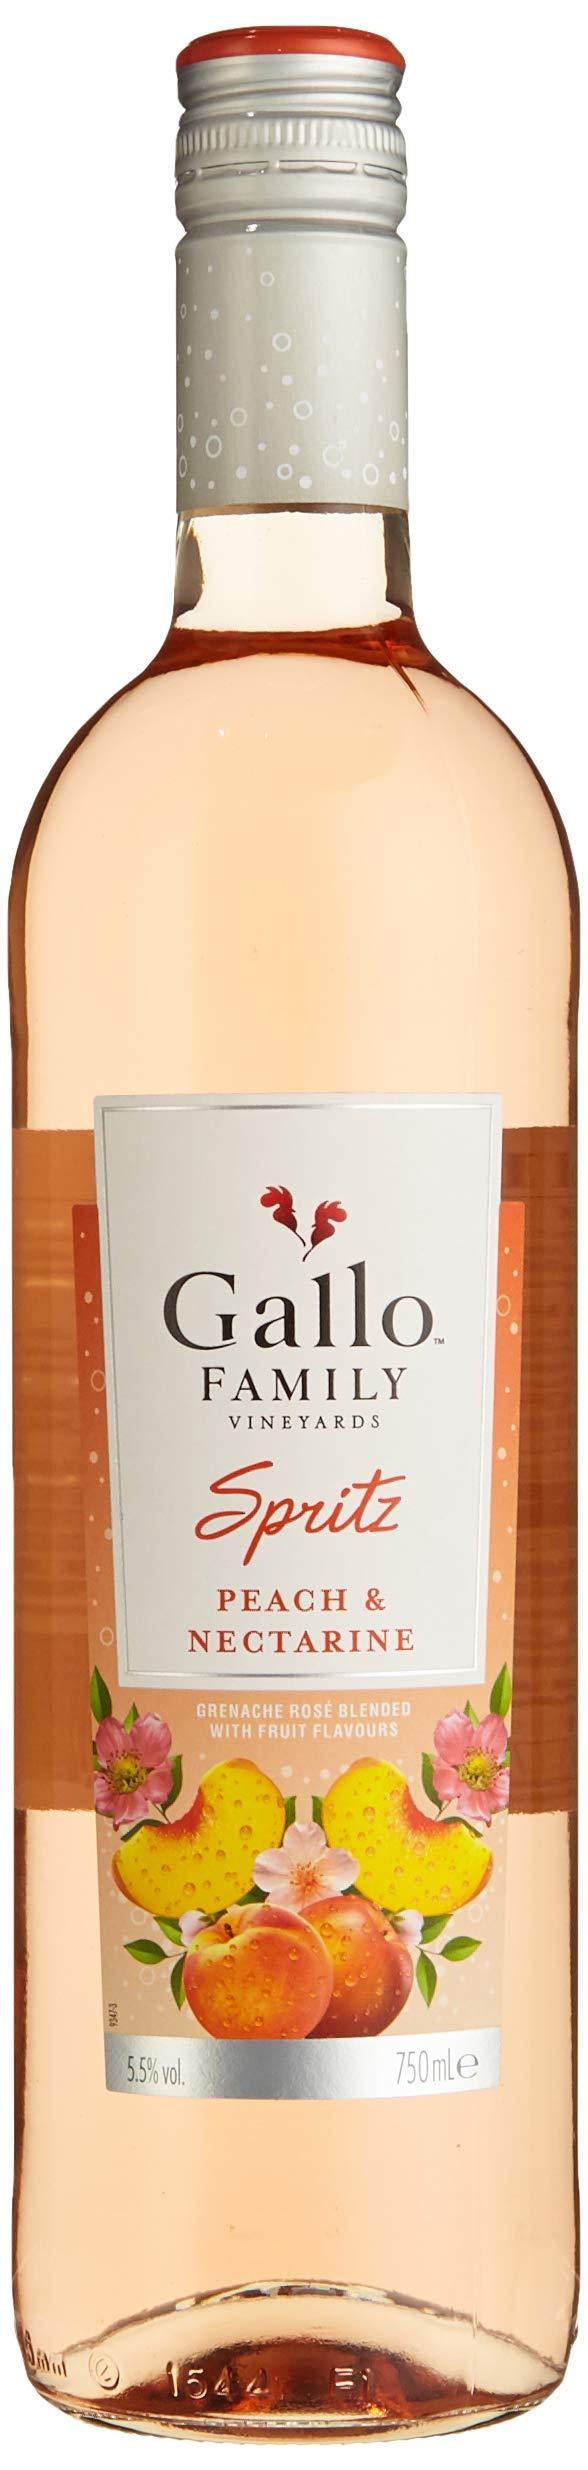 Gallo-Family-Vineyards-S-6-x-075-l